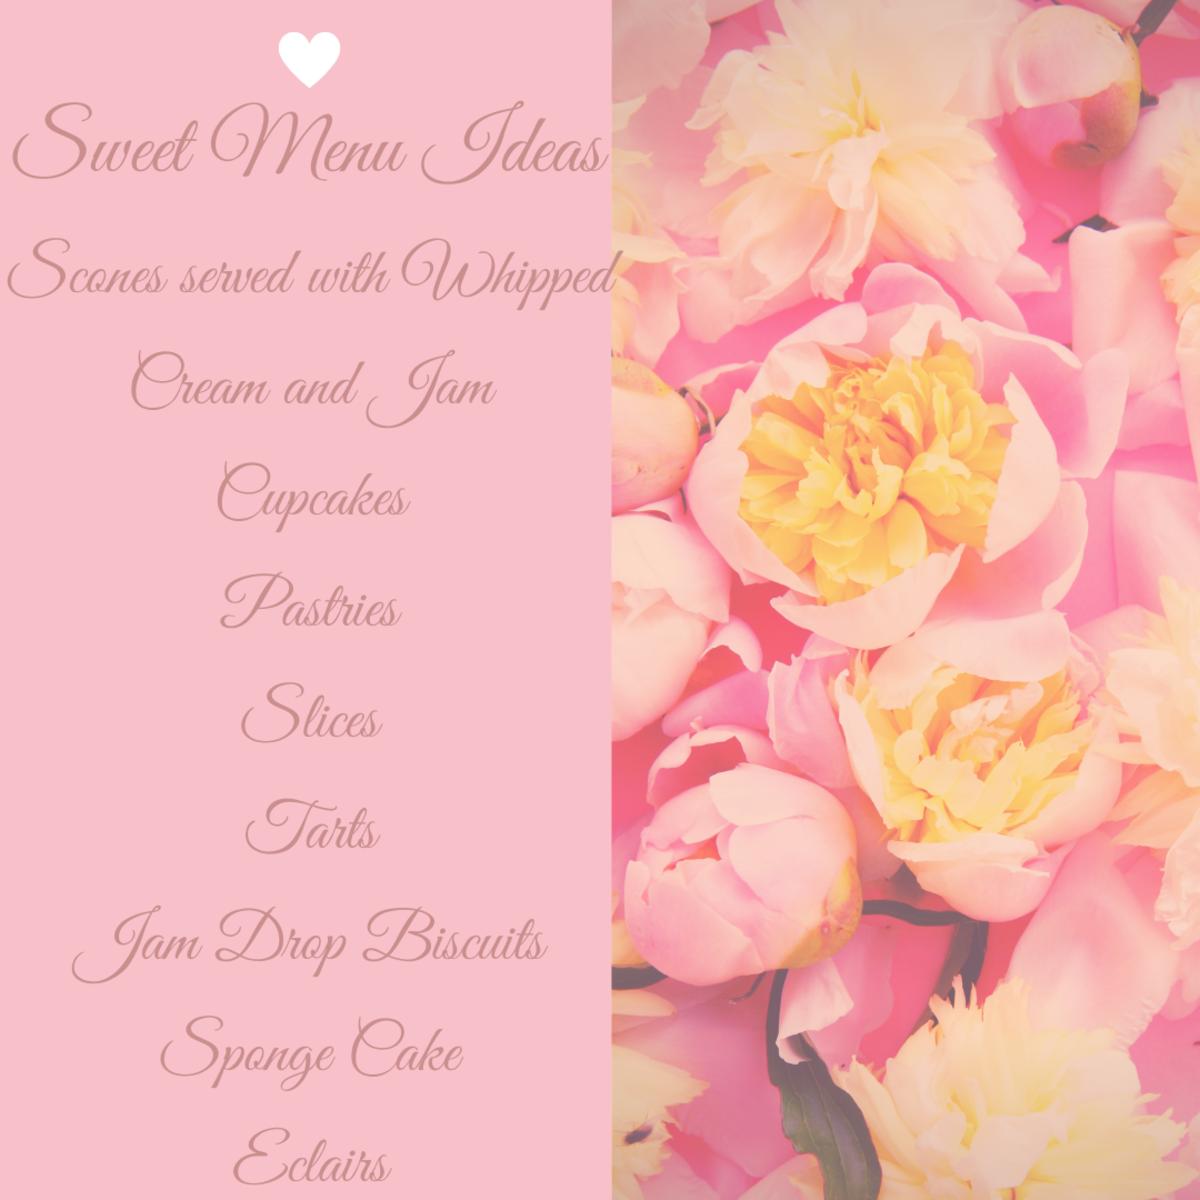 Sweet Menu Ideas